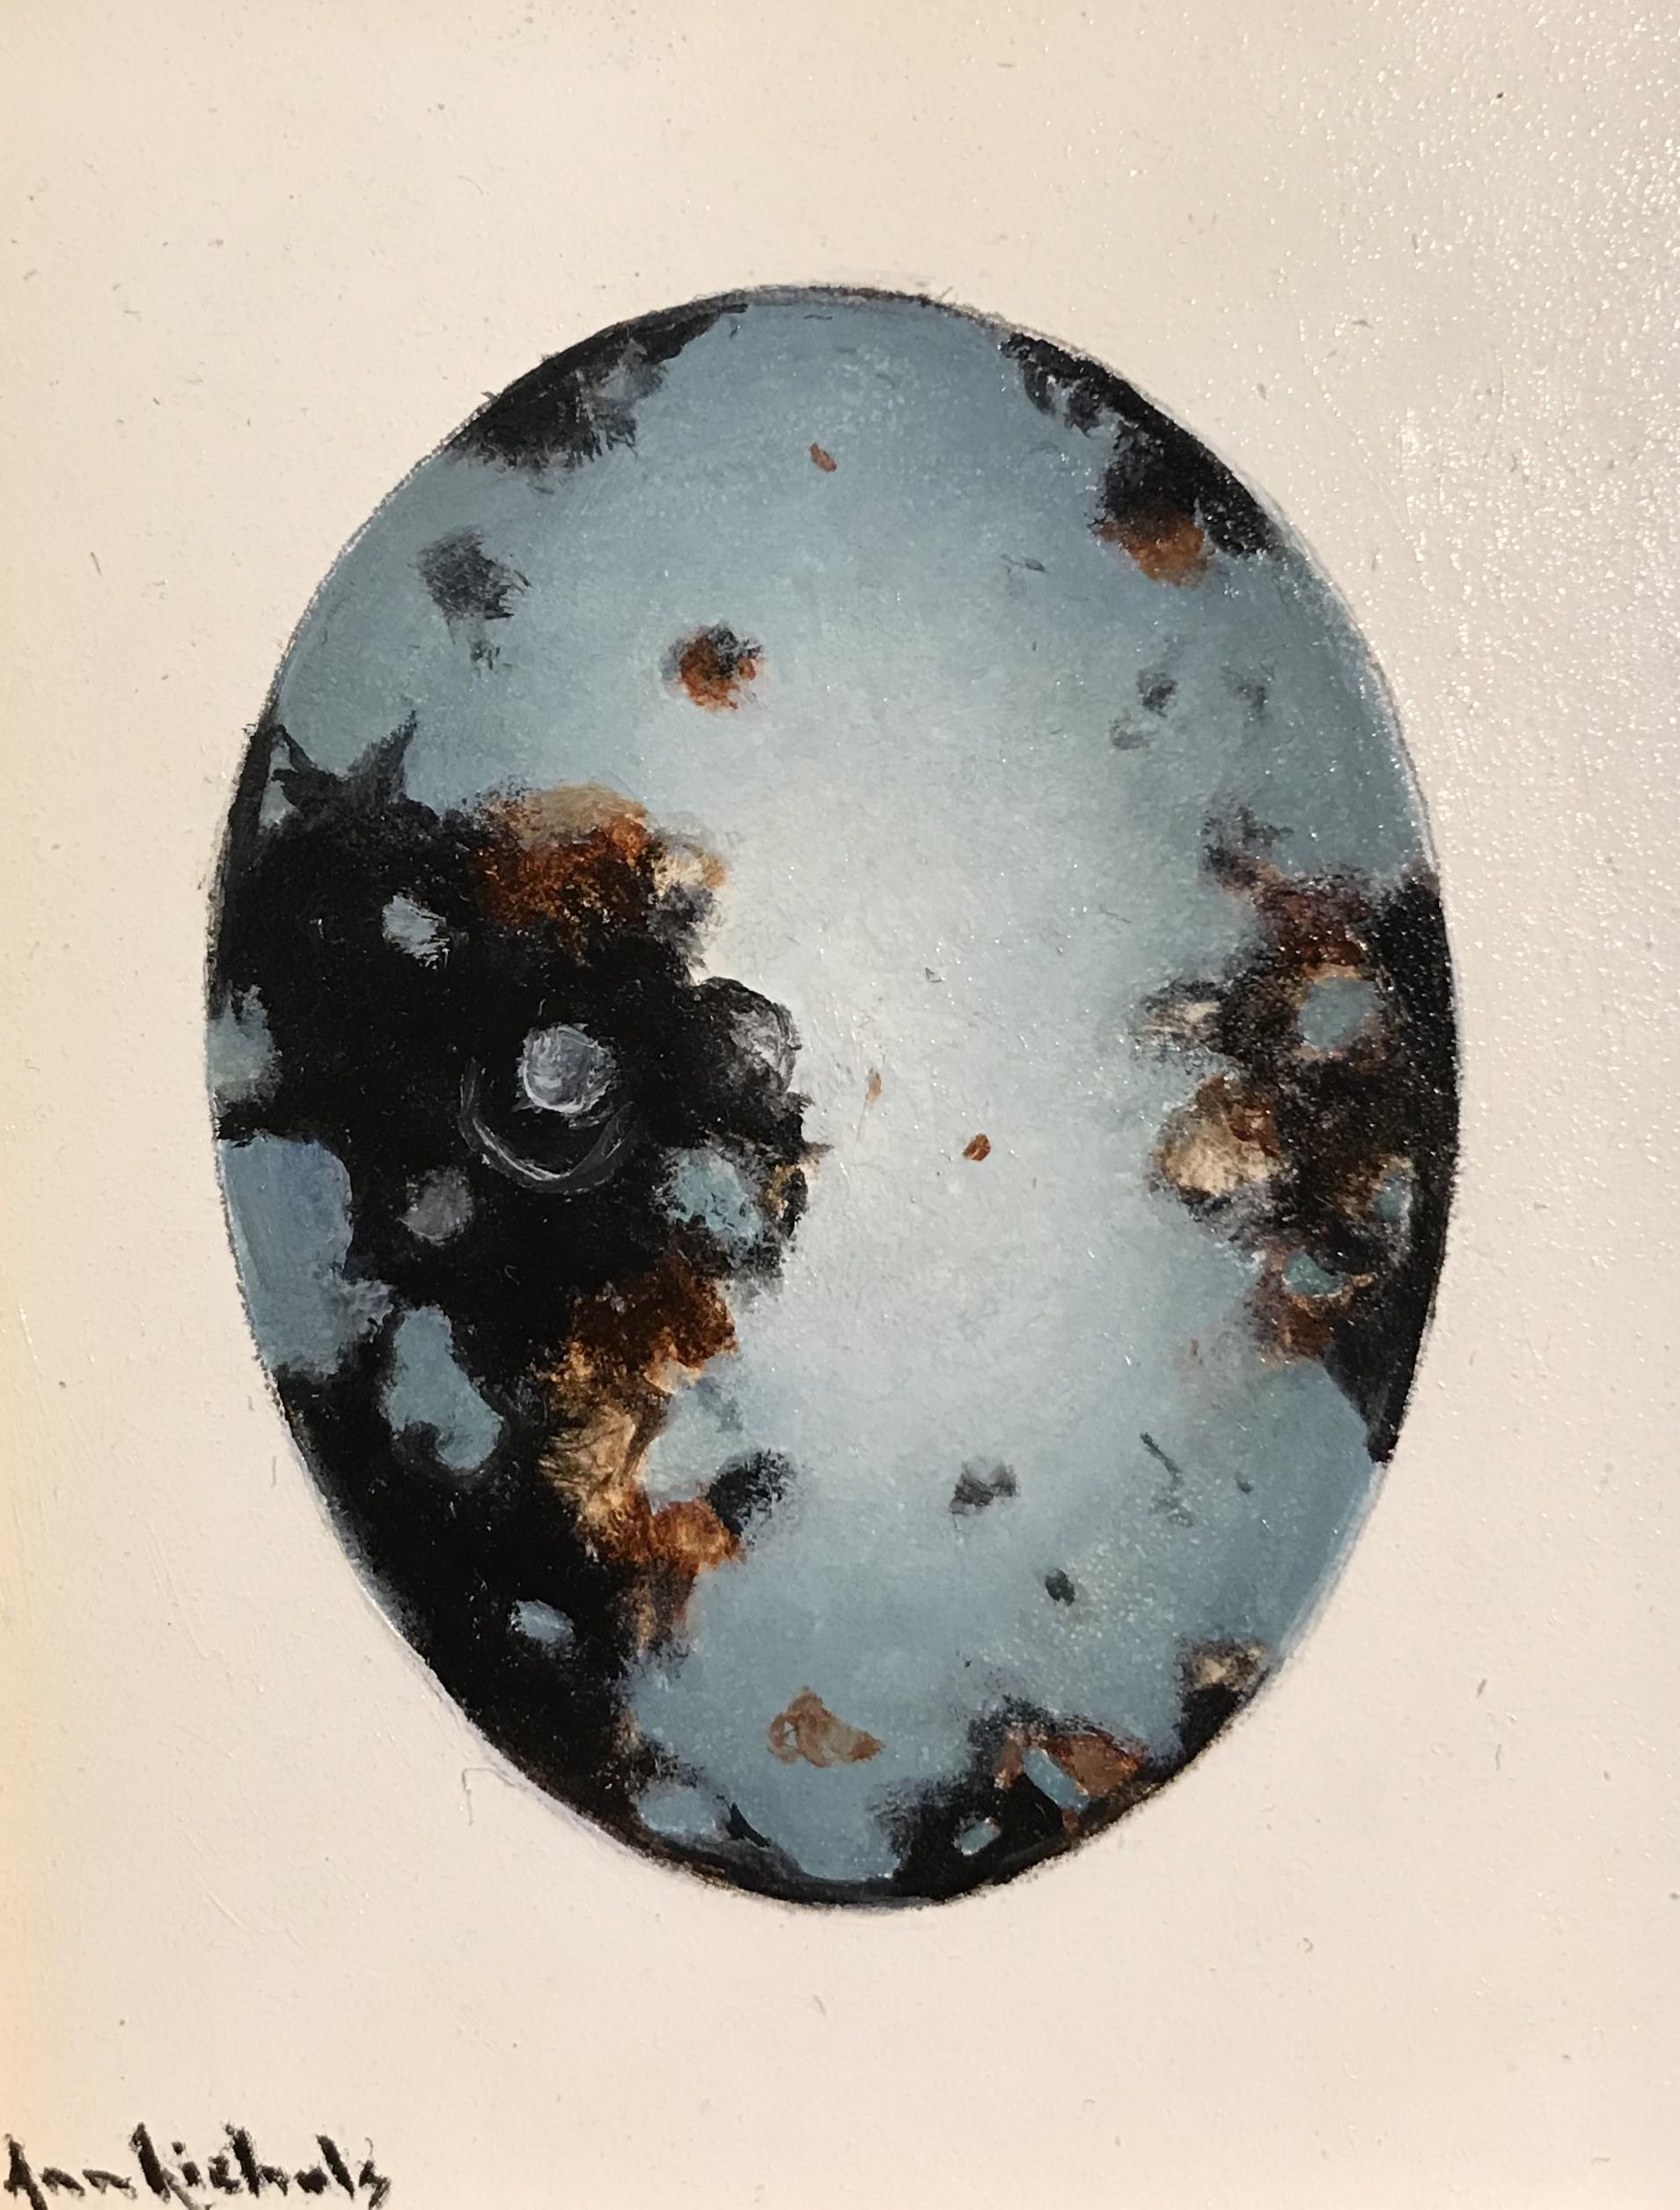 Blue Quail Egg